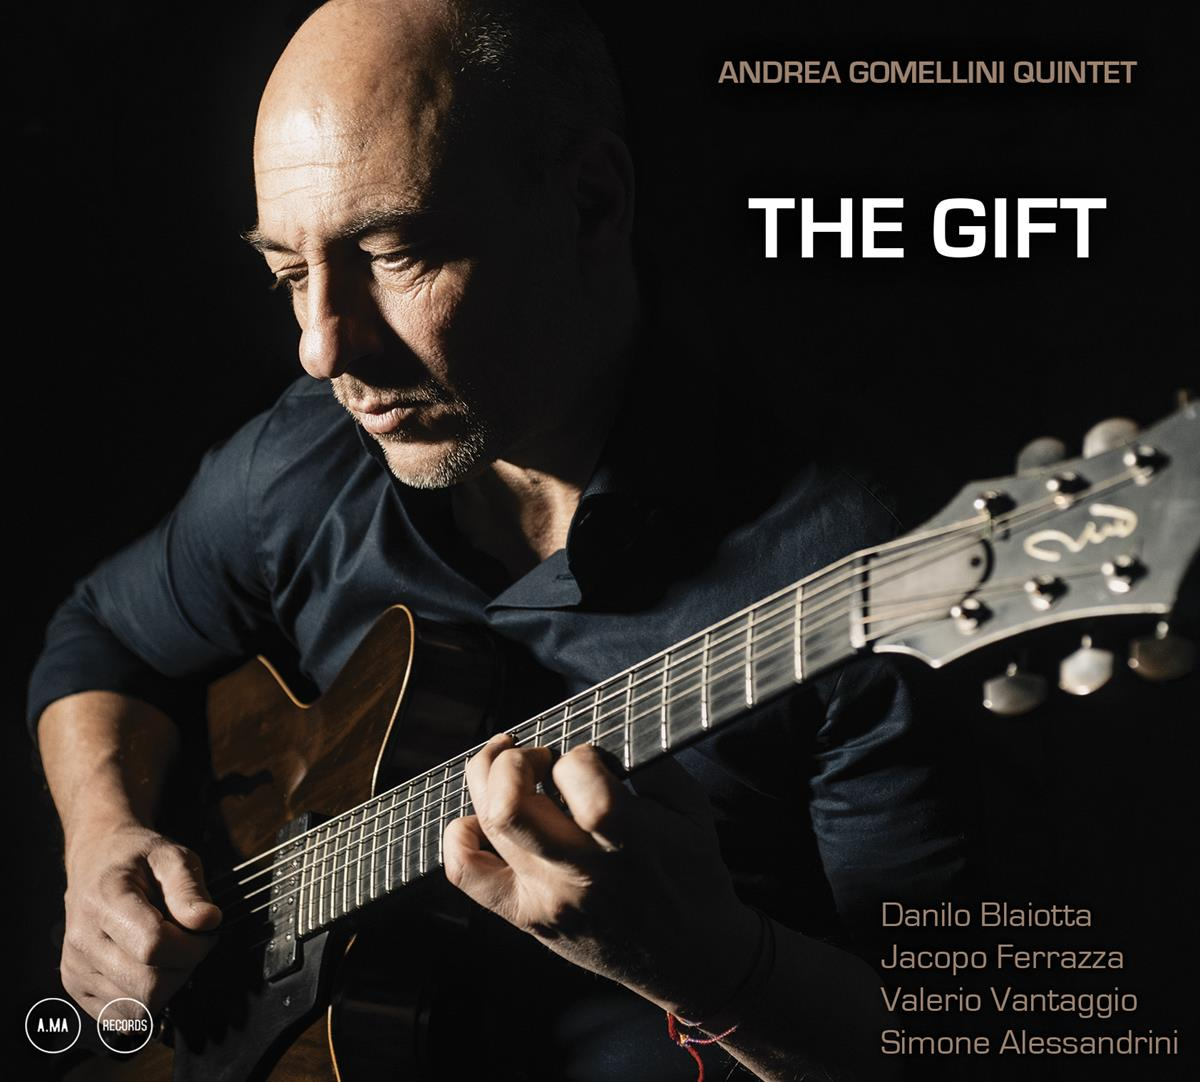 Andrea Gomellini Quintet